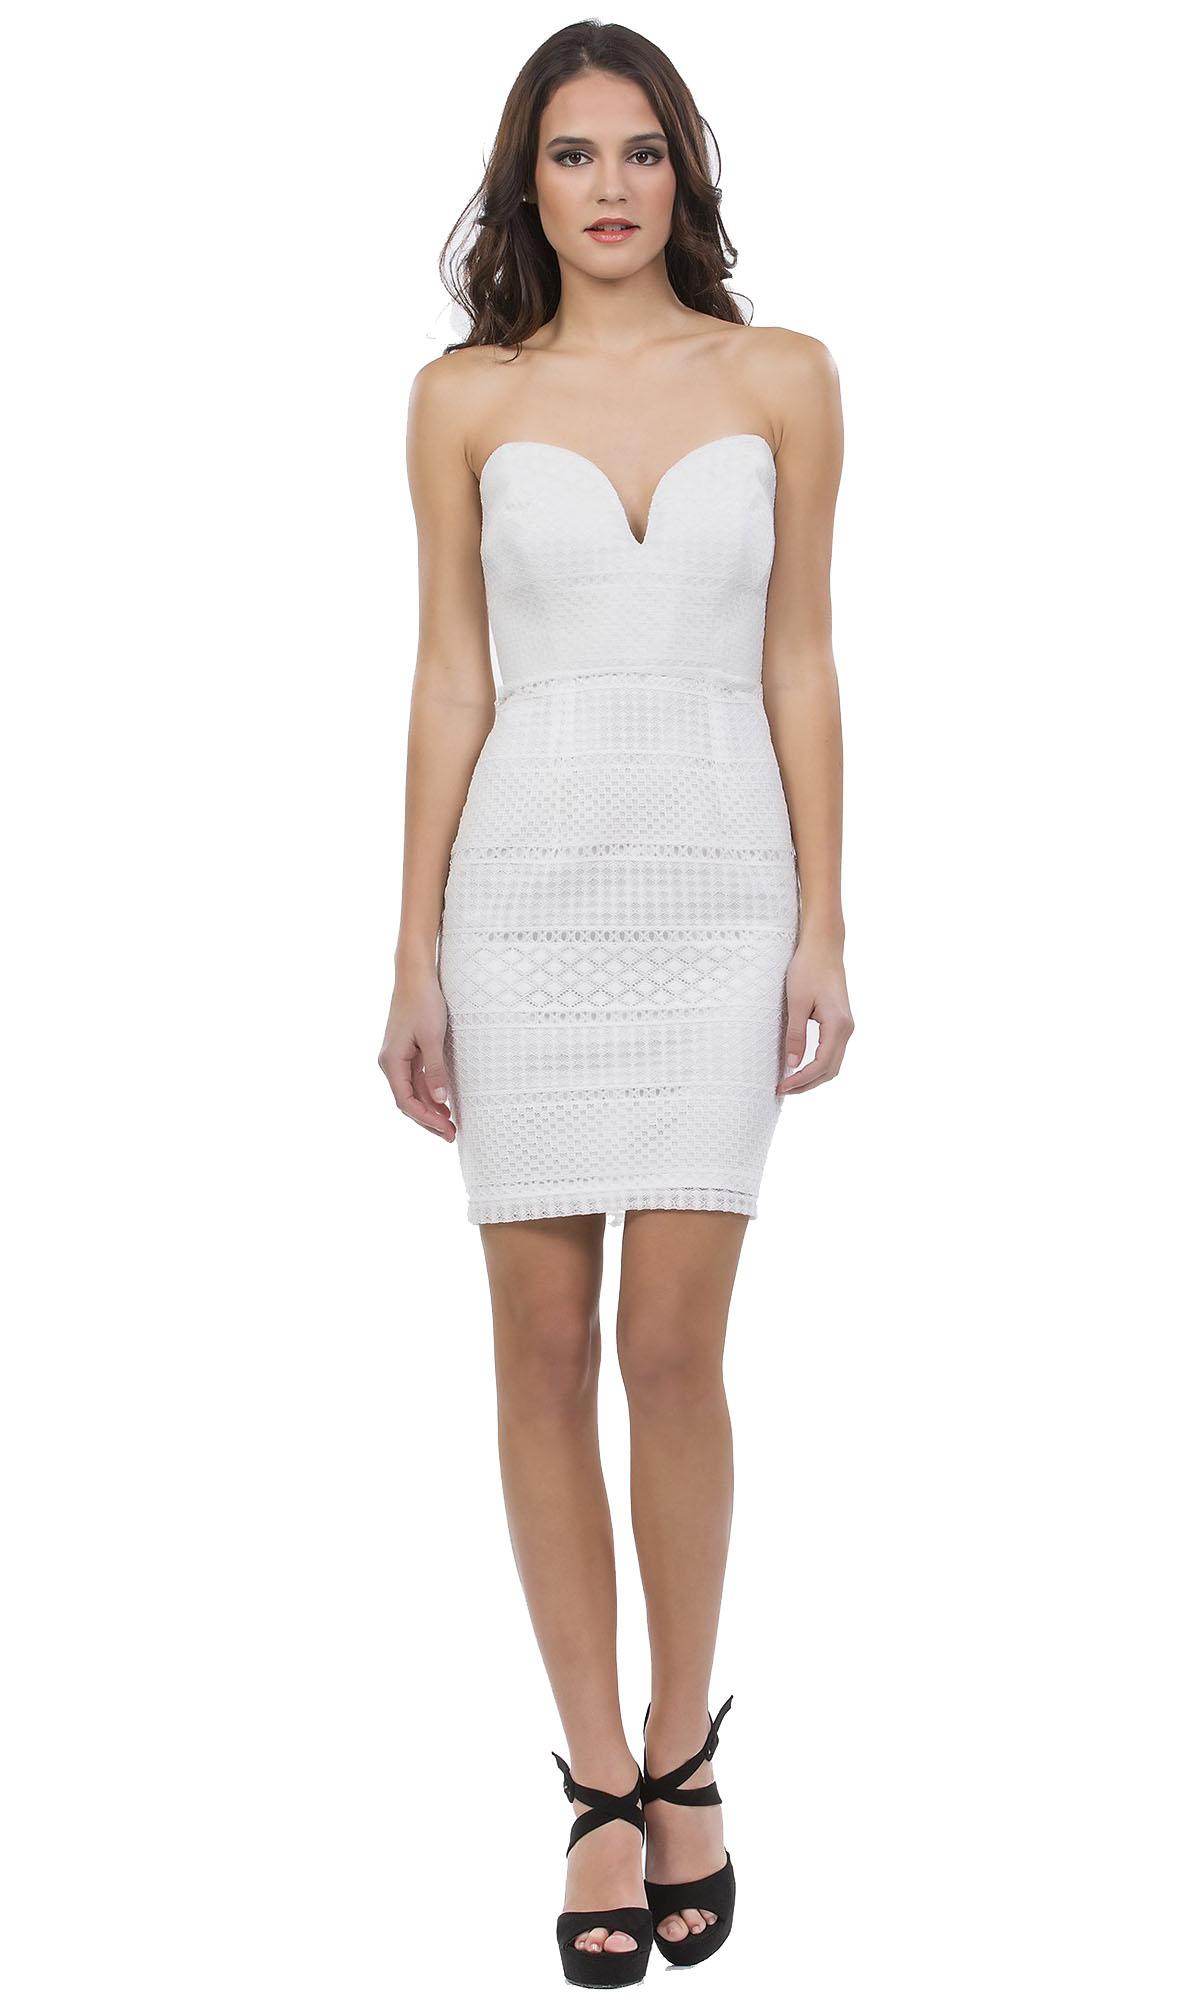 Elegant Bodycon Μίνι Φόρεμα Online με μπούστο καρδιά - OEM - SS17ON-53536 φορέματα βραδυνά φορέματα